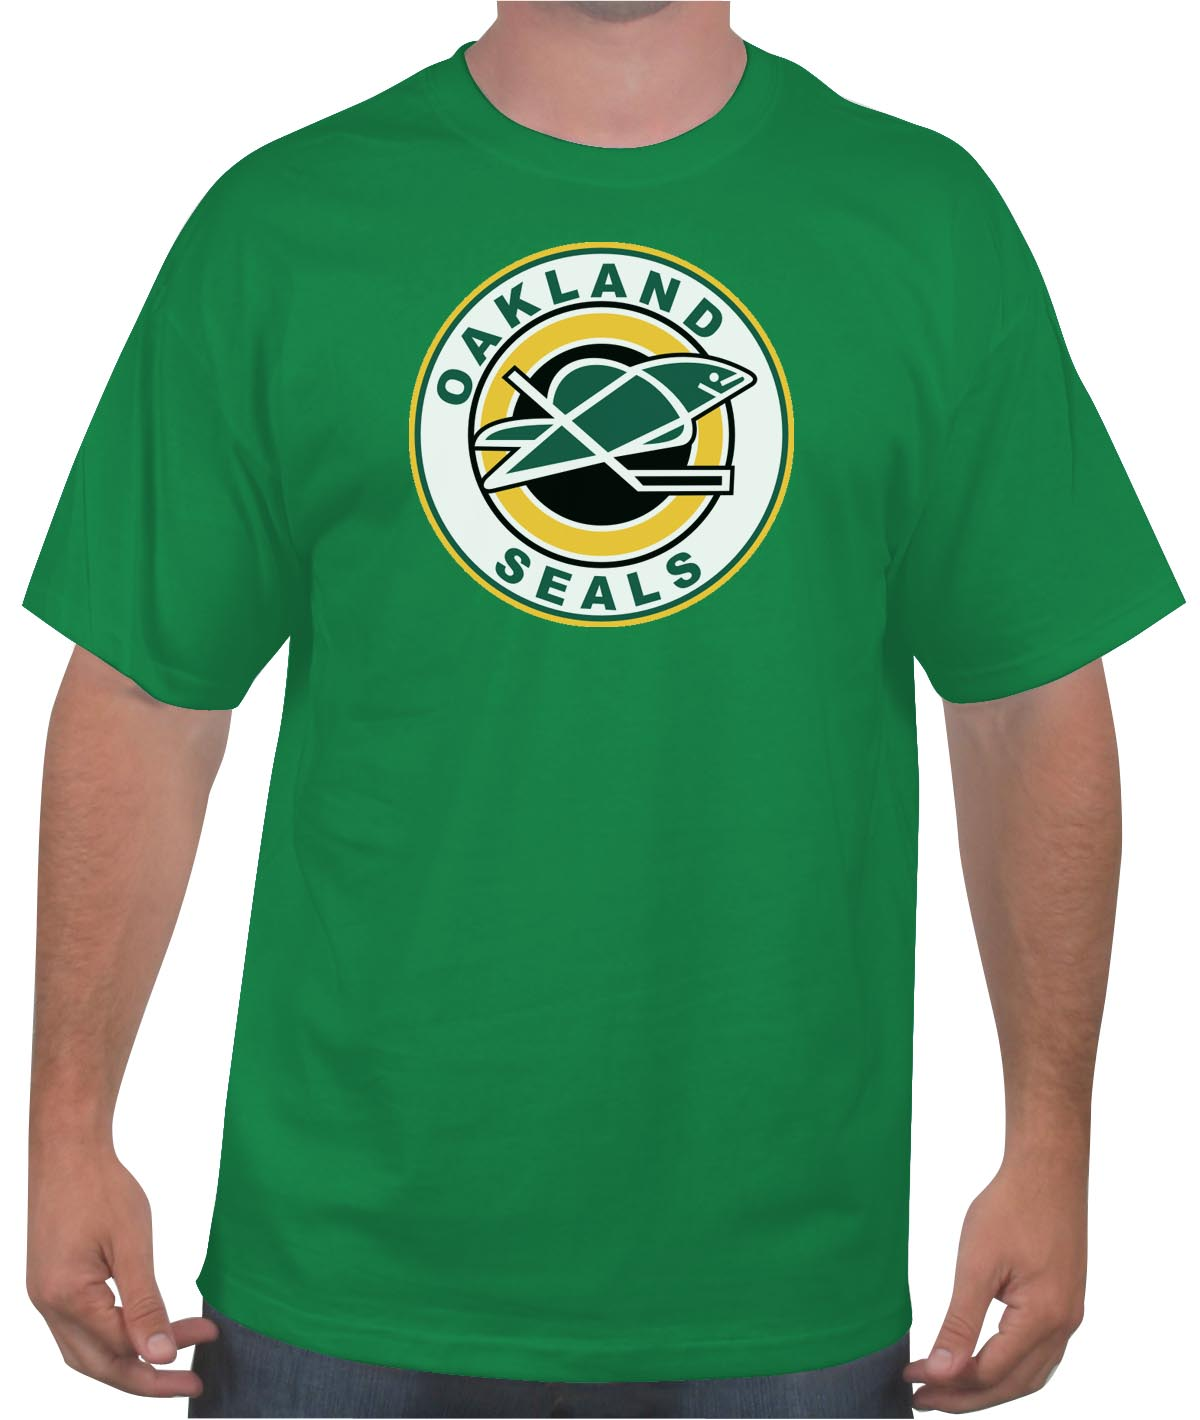 Oakland Seals Nhl 1967 1970 Hockey T Shirt